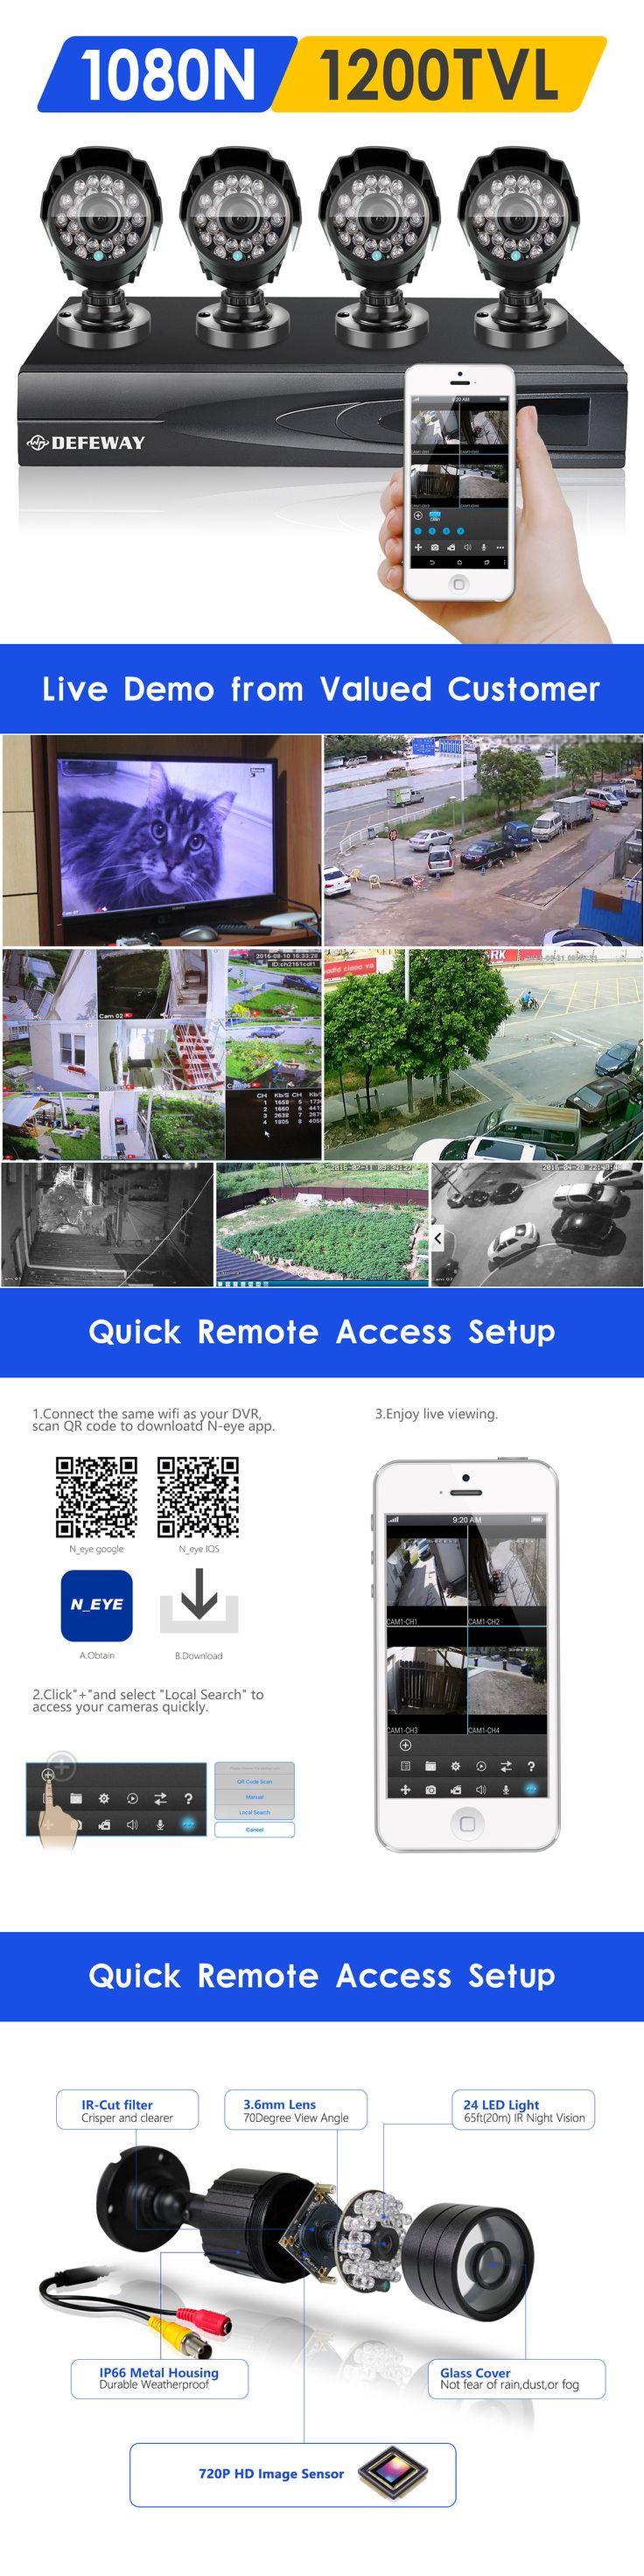 Surveillance security systems defeway 1500tvl ir outdoor home surveillance security camera 1080n hd dvr system